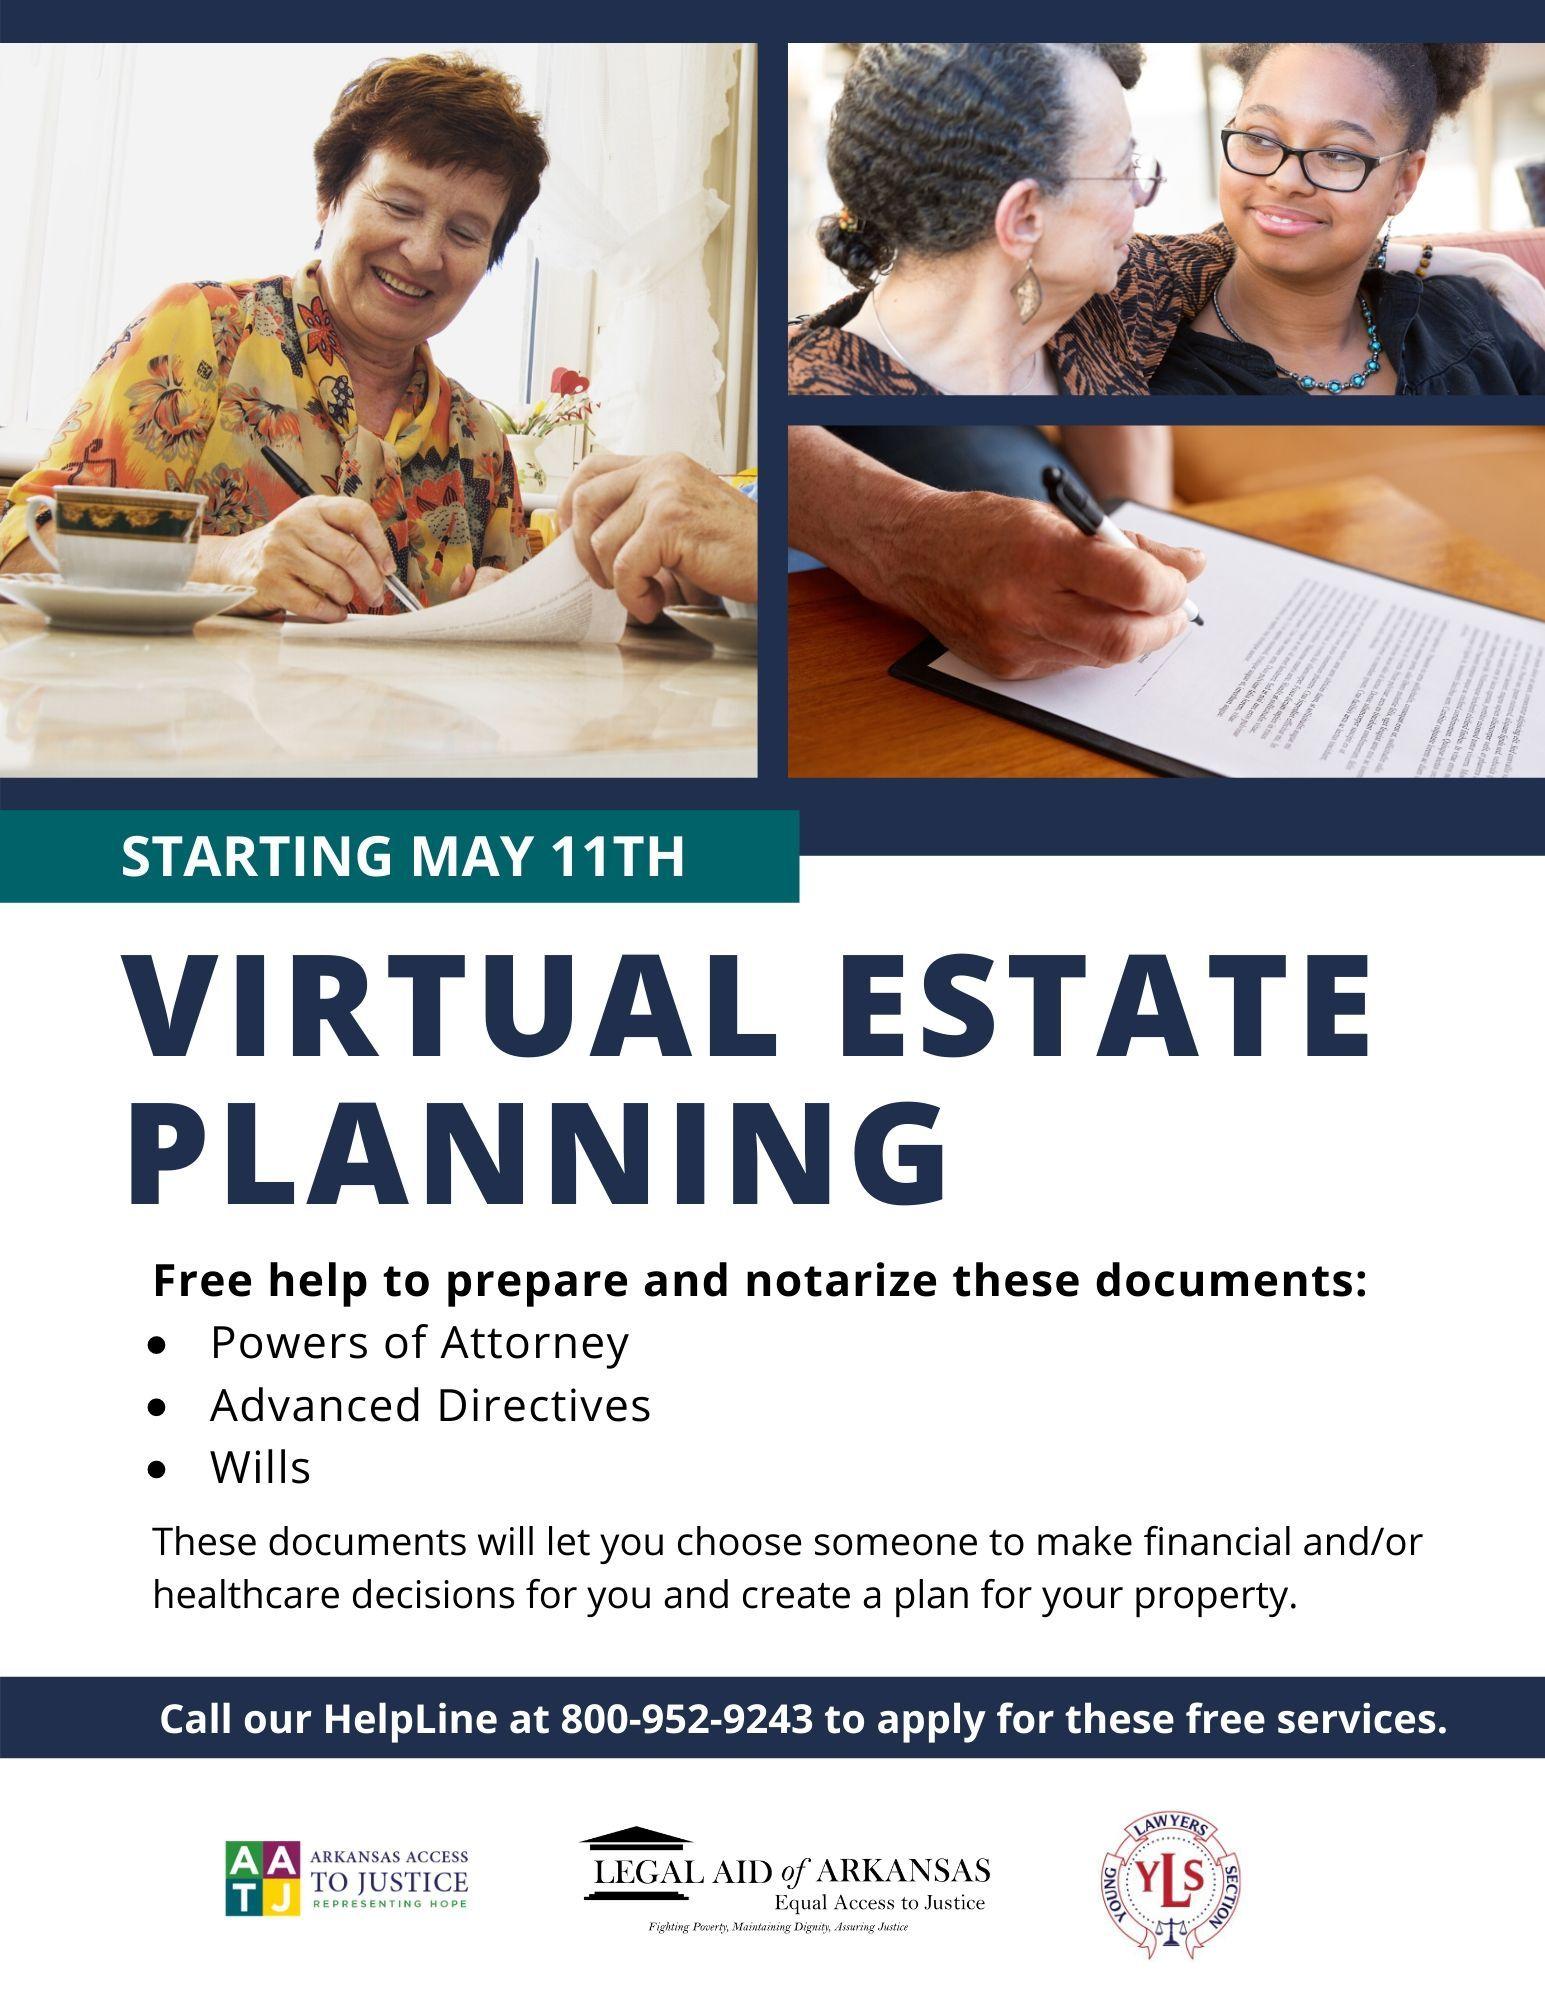 Virtual Estate Planning Starting May 11th